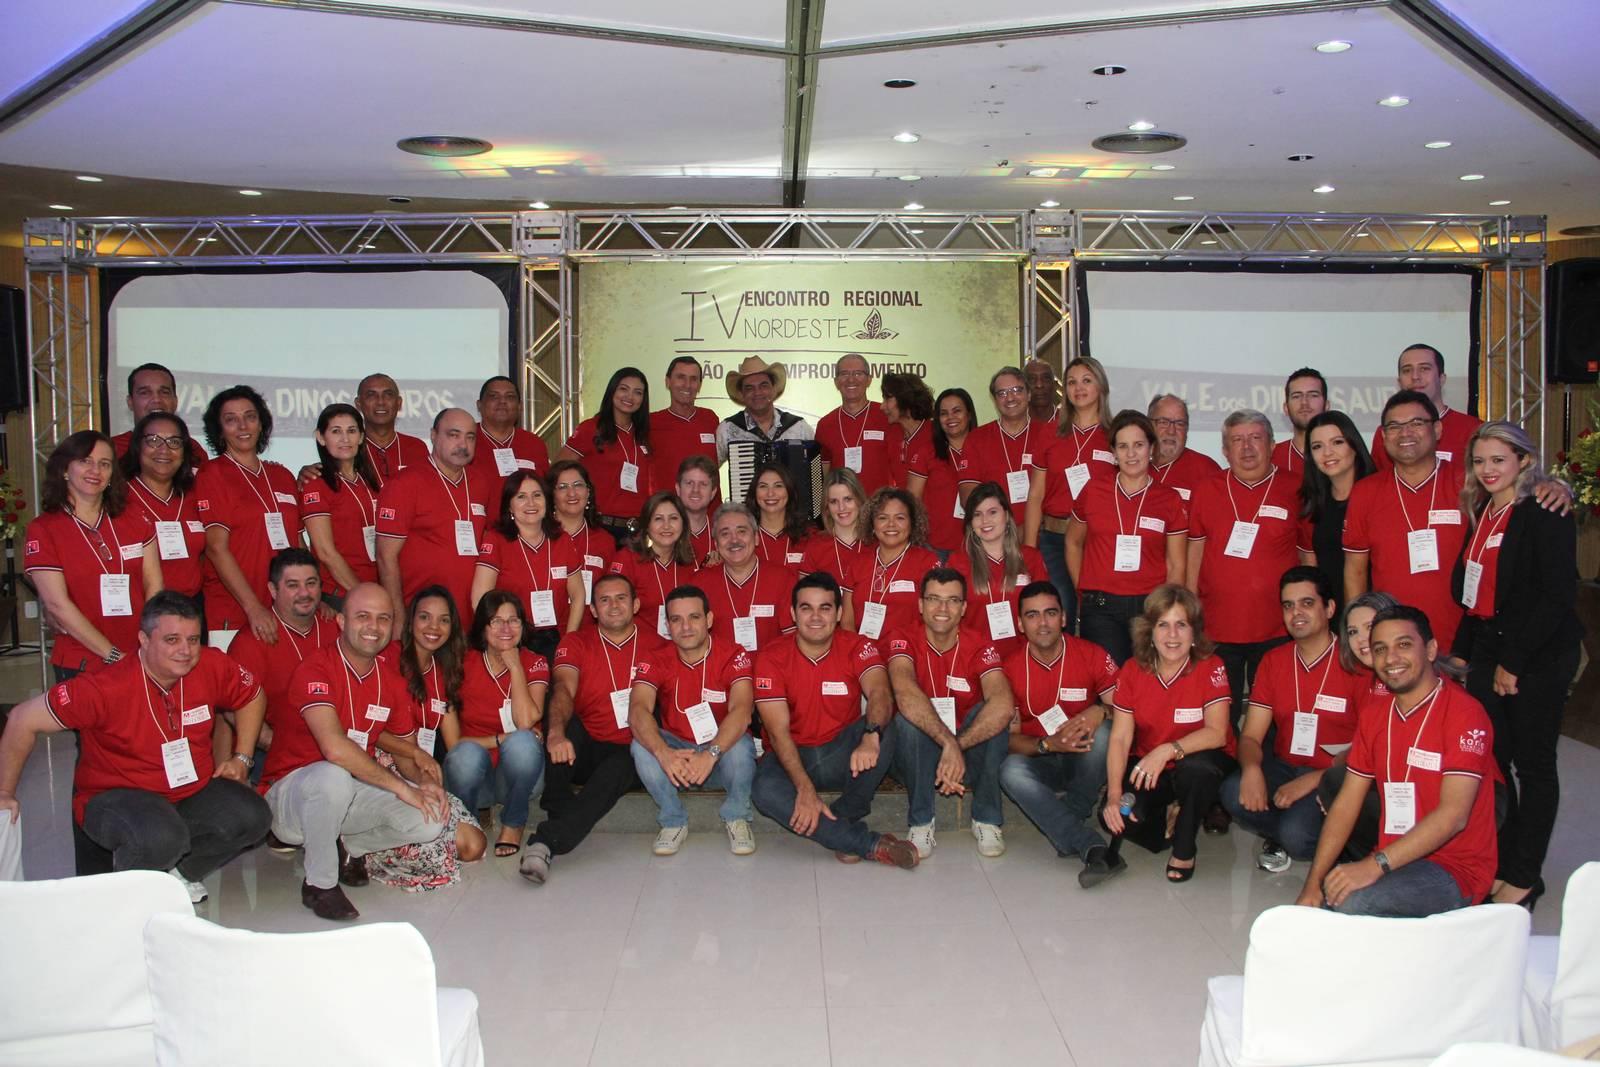 IV Encontro Regional do Nordeste - Bio Extratus (91)